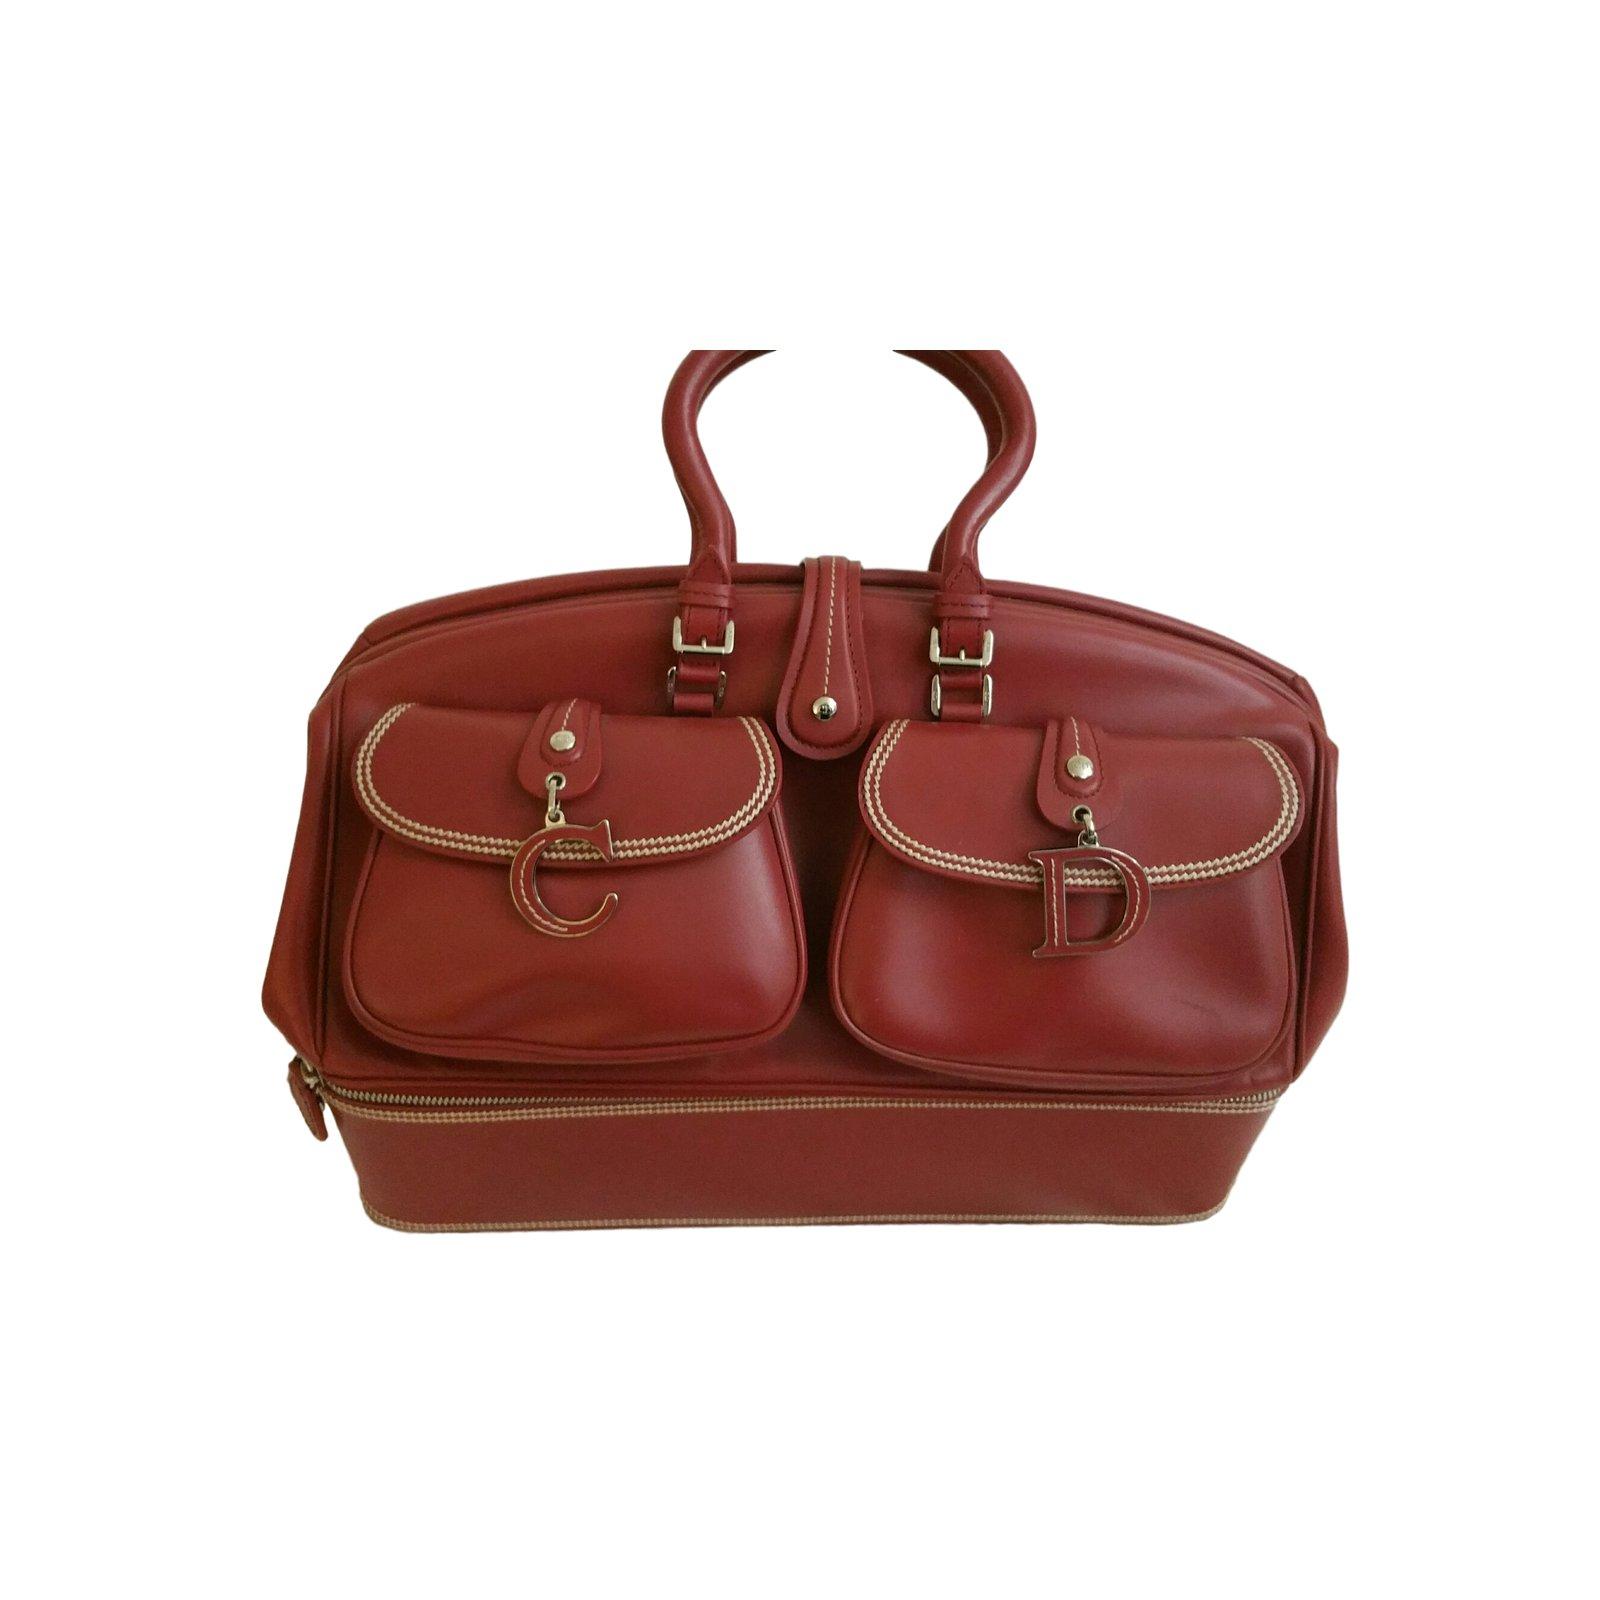 be439c5890c9 Christian Dior Handbags Handbags Leather Red ref.11983 - Joli Closet